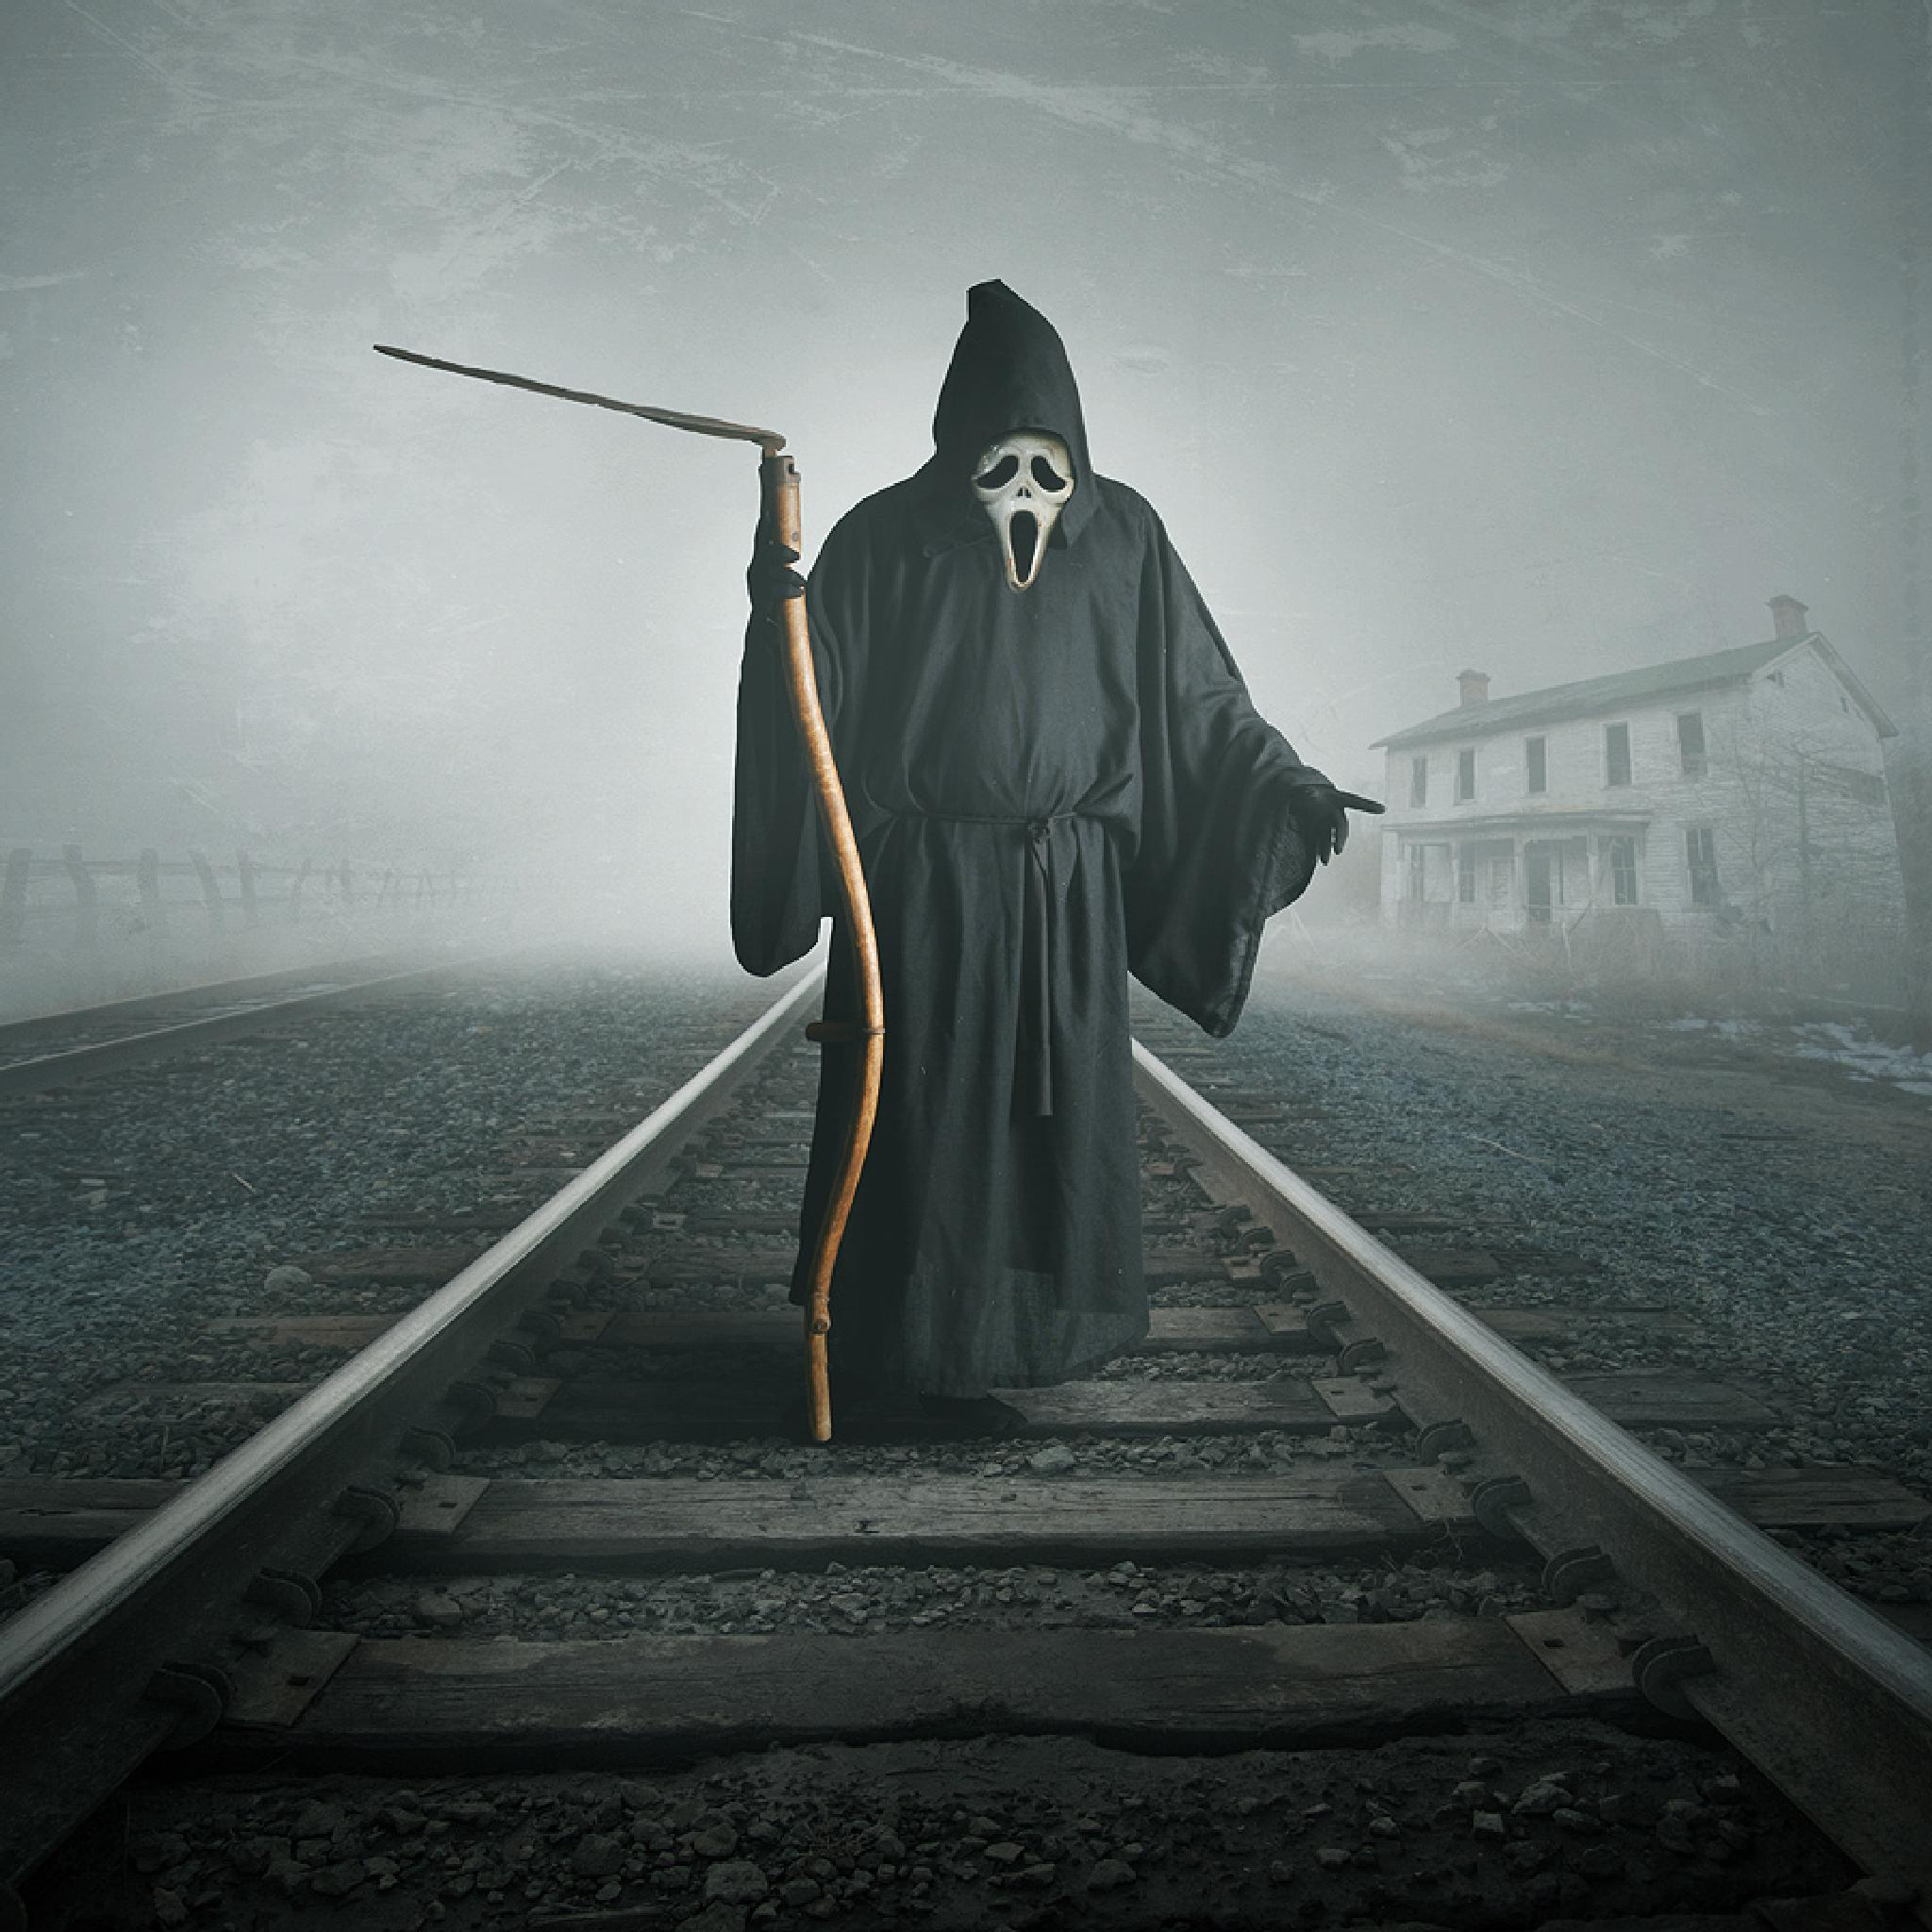 mr death by Tom